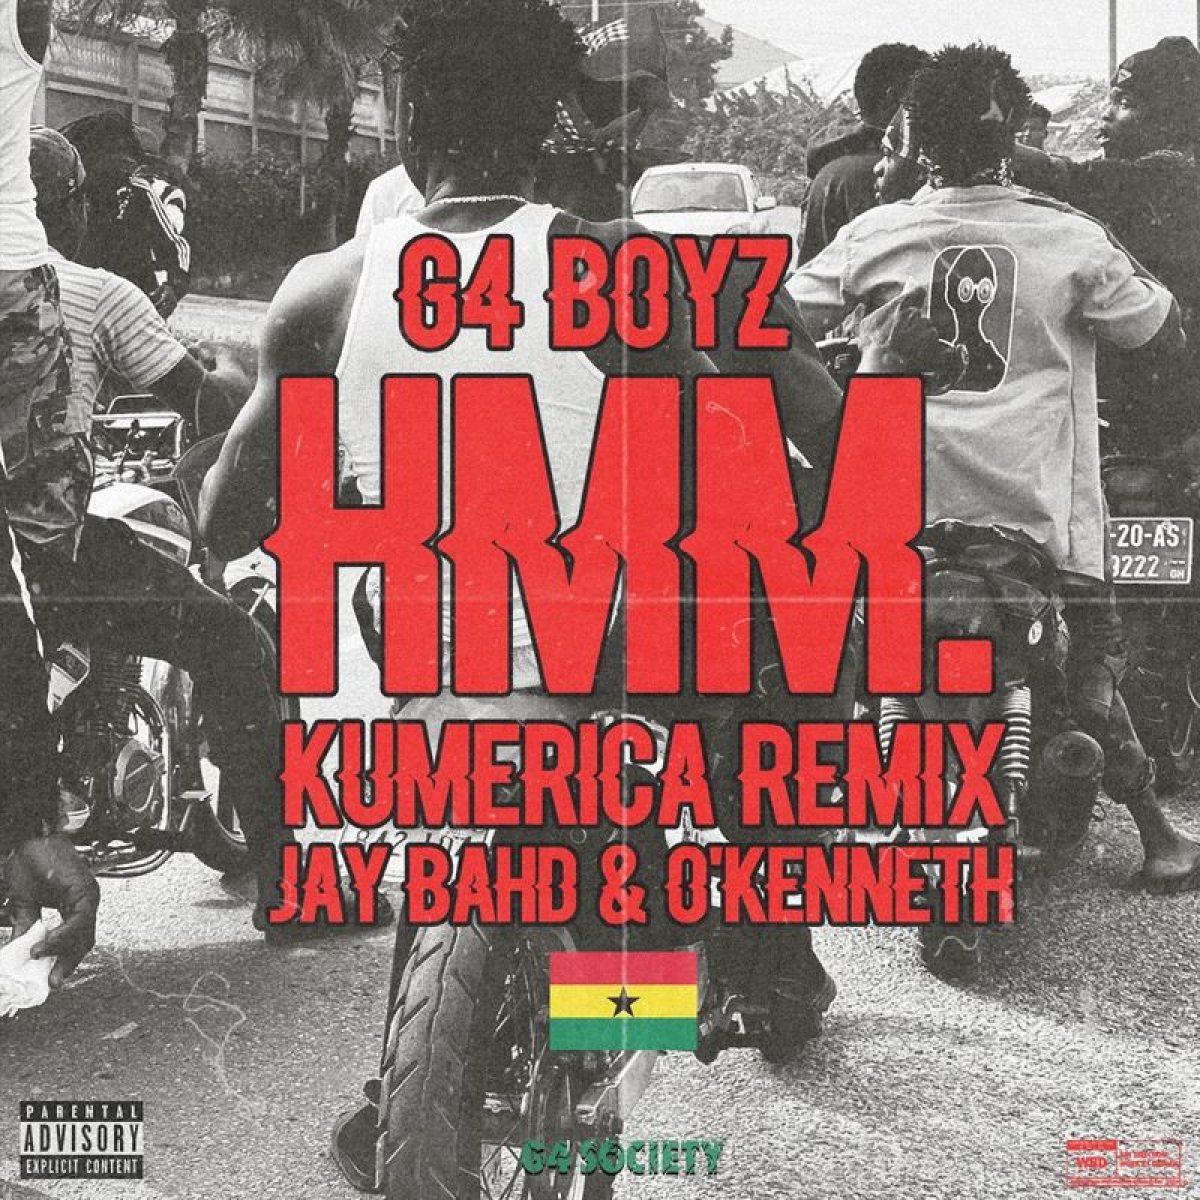 G4 Boyz – Hmm (Kumerica Remix) Ft. Jay Bahd, O'Kenneth mp3 download